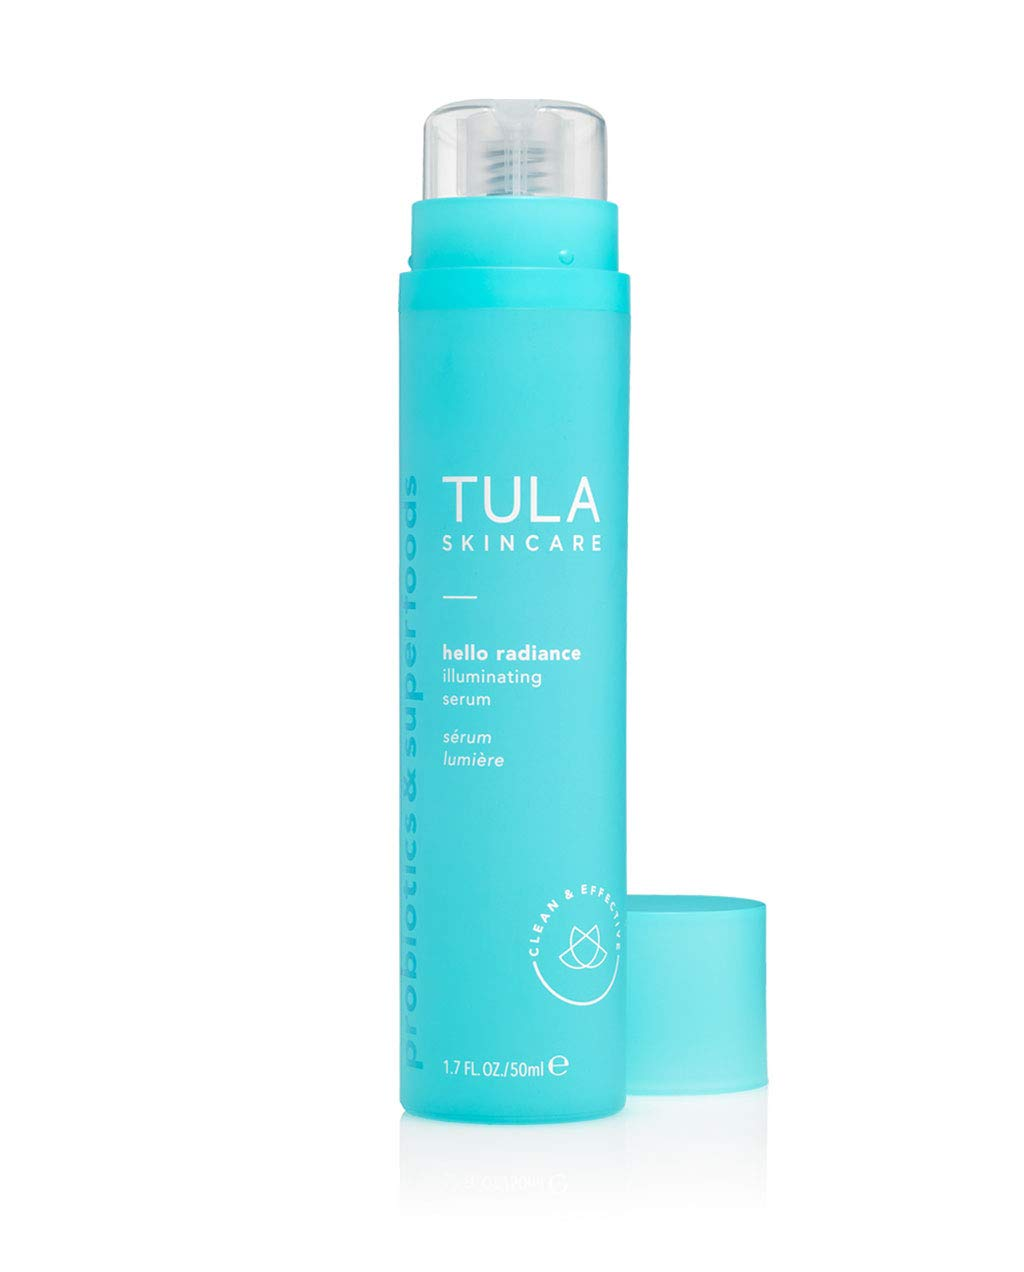 TULA Probiotic Skin Care Hello Radiance Illuminating Face Serum | Brightening Serum, Target the Appearance of Dark Spots and Hyperpigmentation | 1.6 oz.